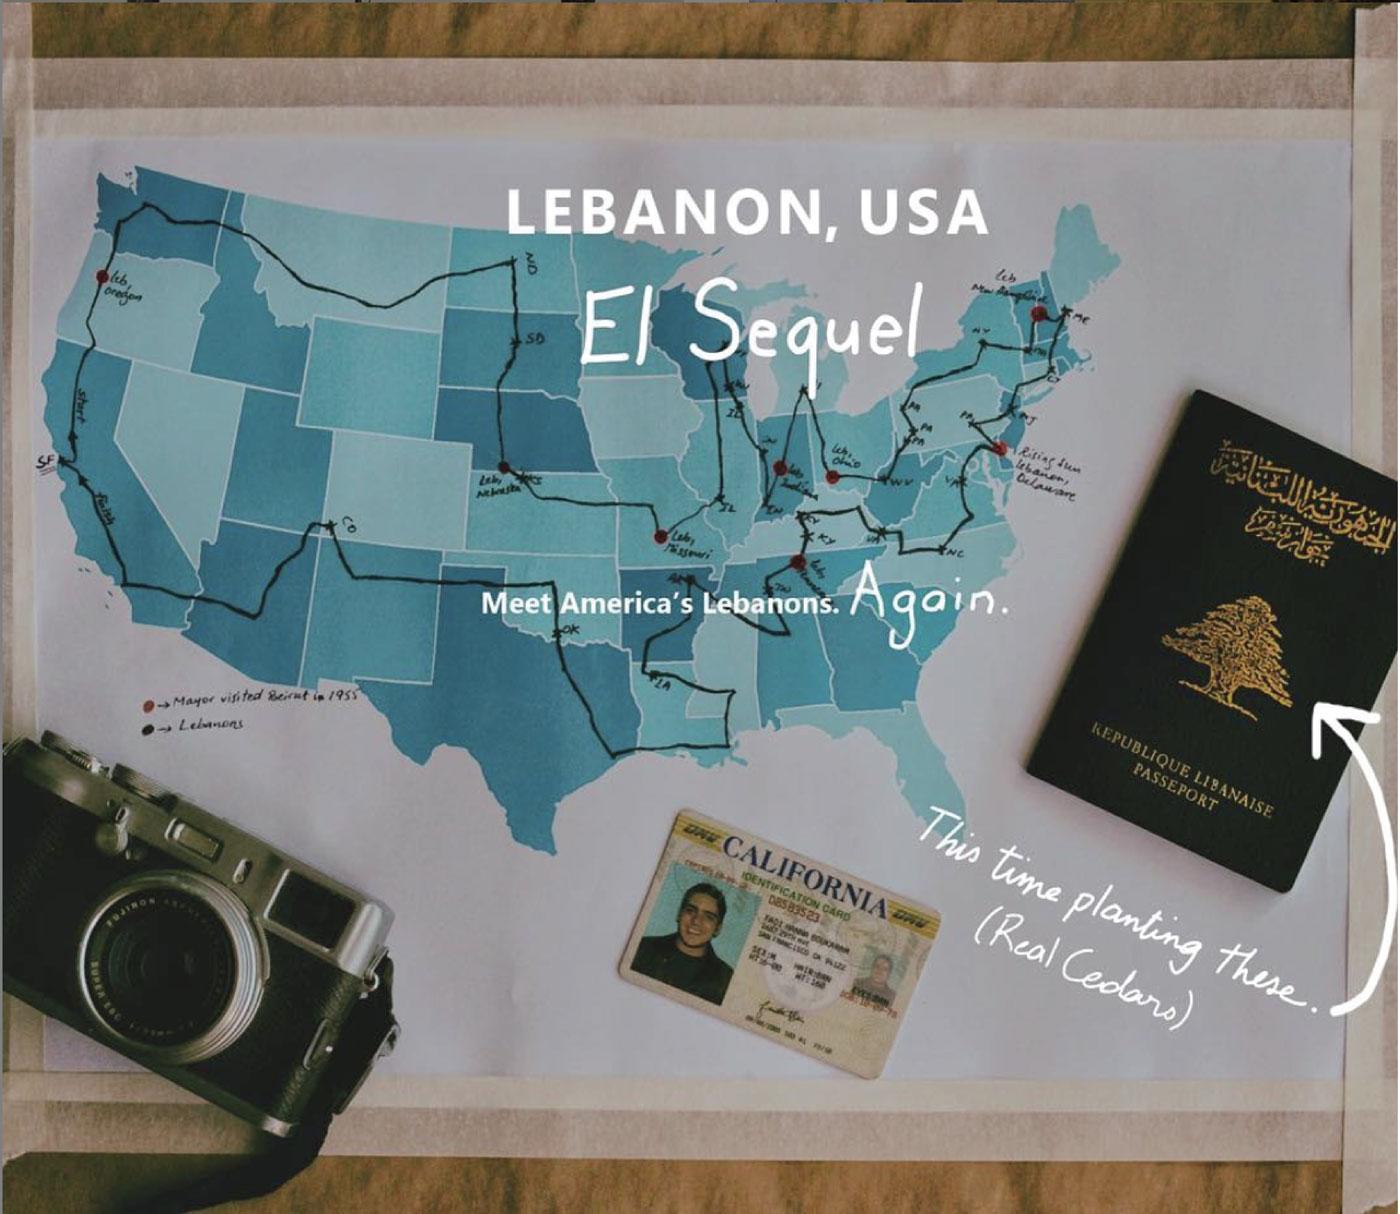 Lebanon, USA: The Sequel - A talk by Lebanese photographer Fadi Boukaram on February 20